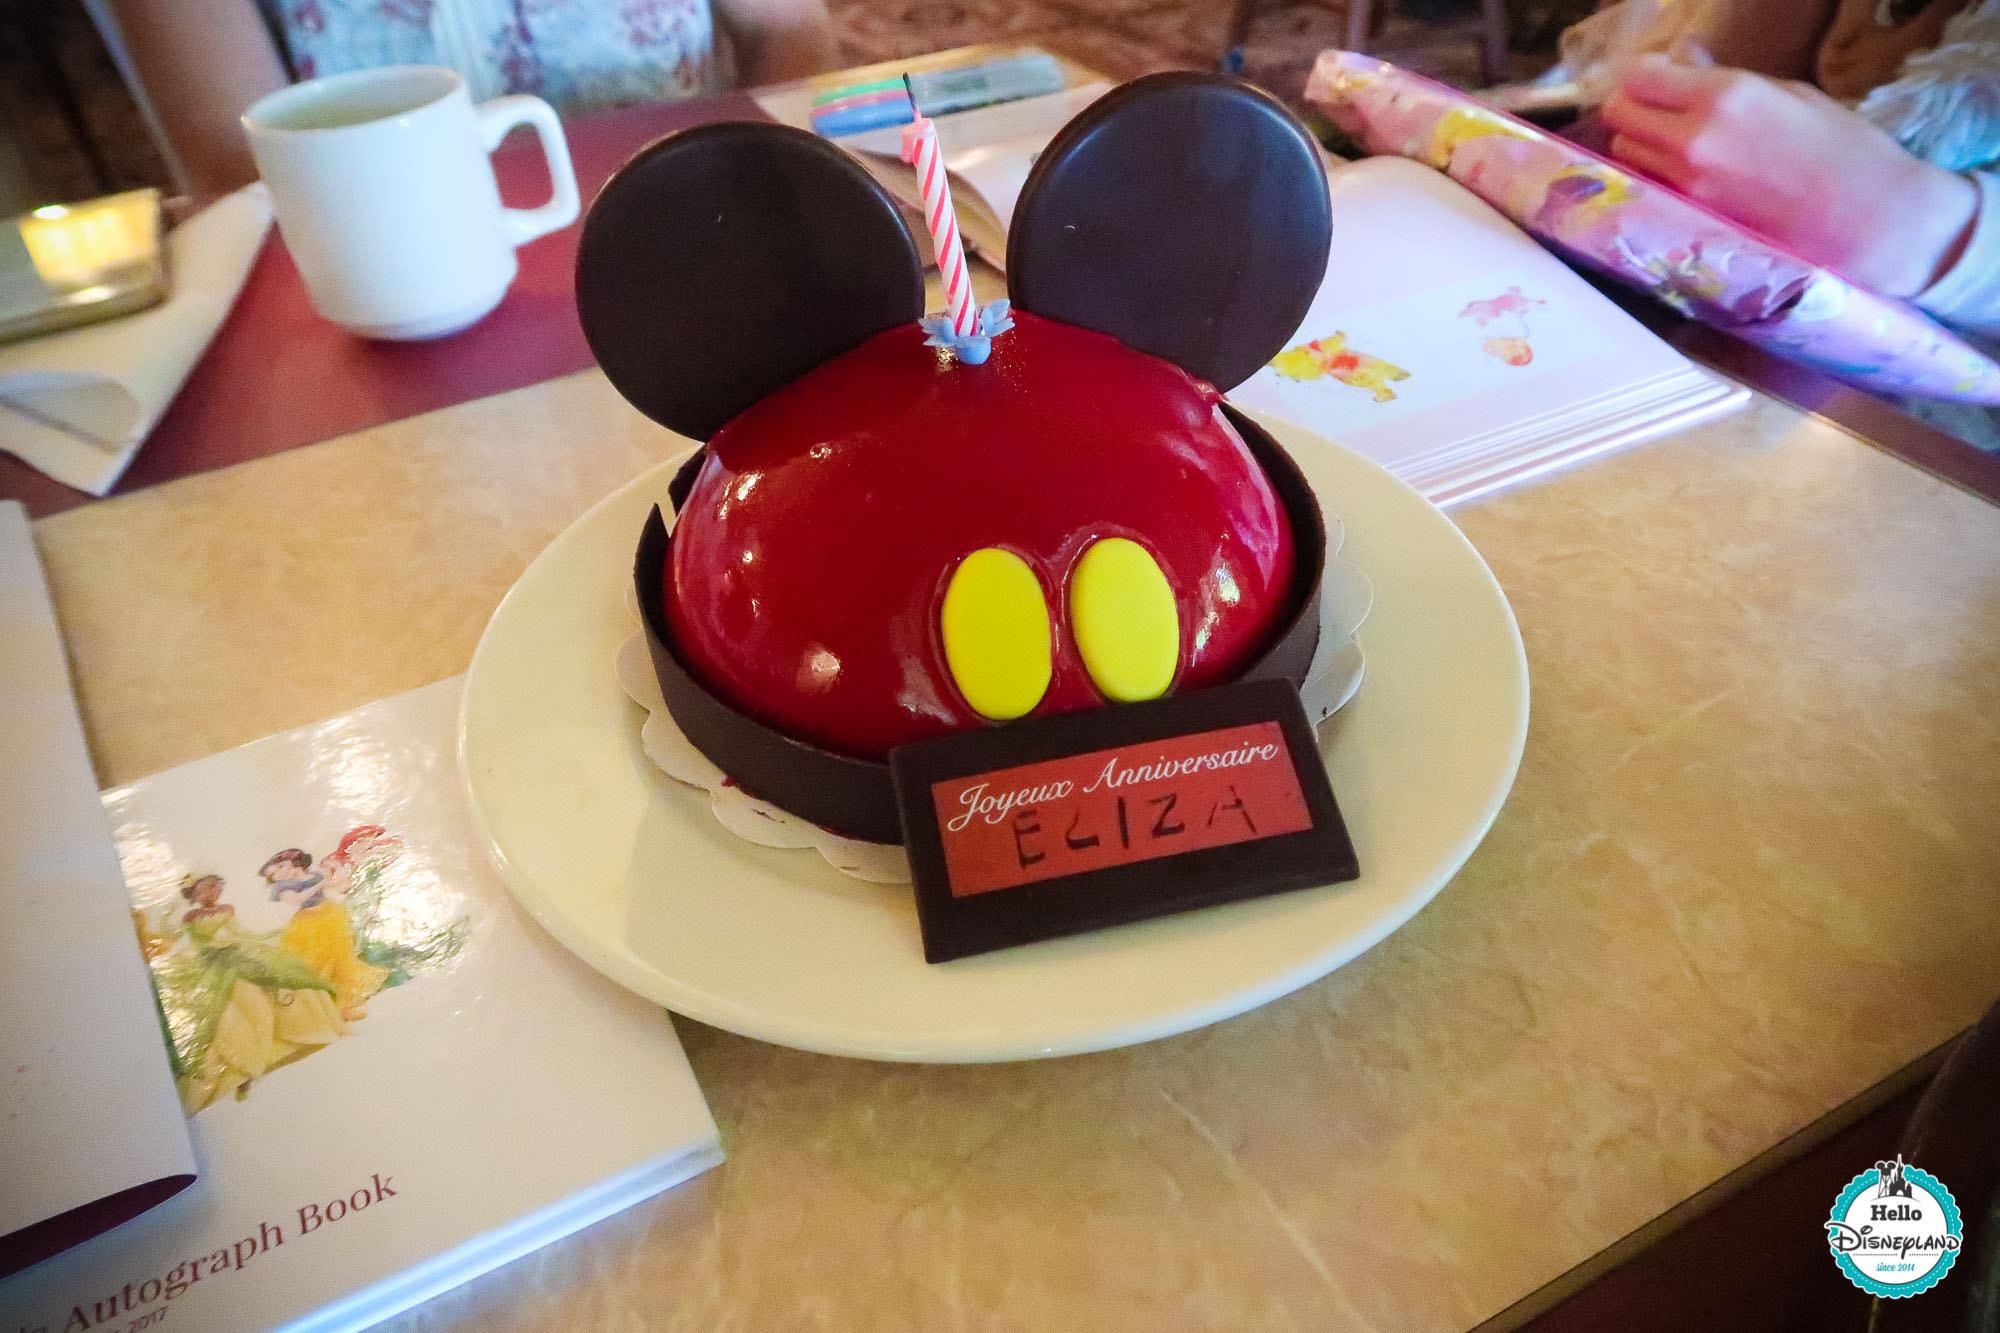 Feter Son Anniversaire A Disneyland Paris Toutes Les Infos Hello Disneyland